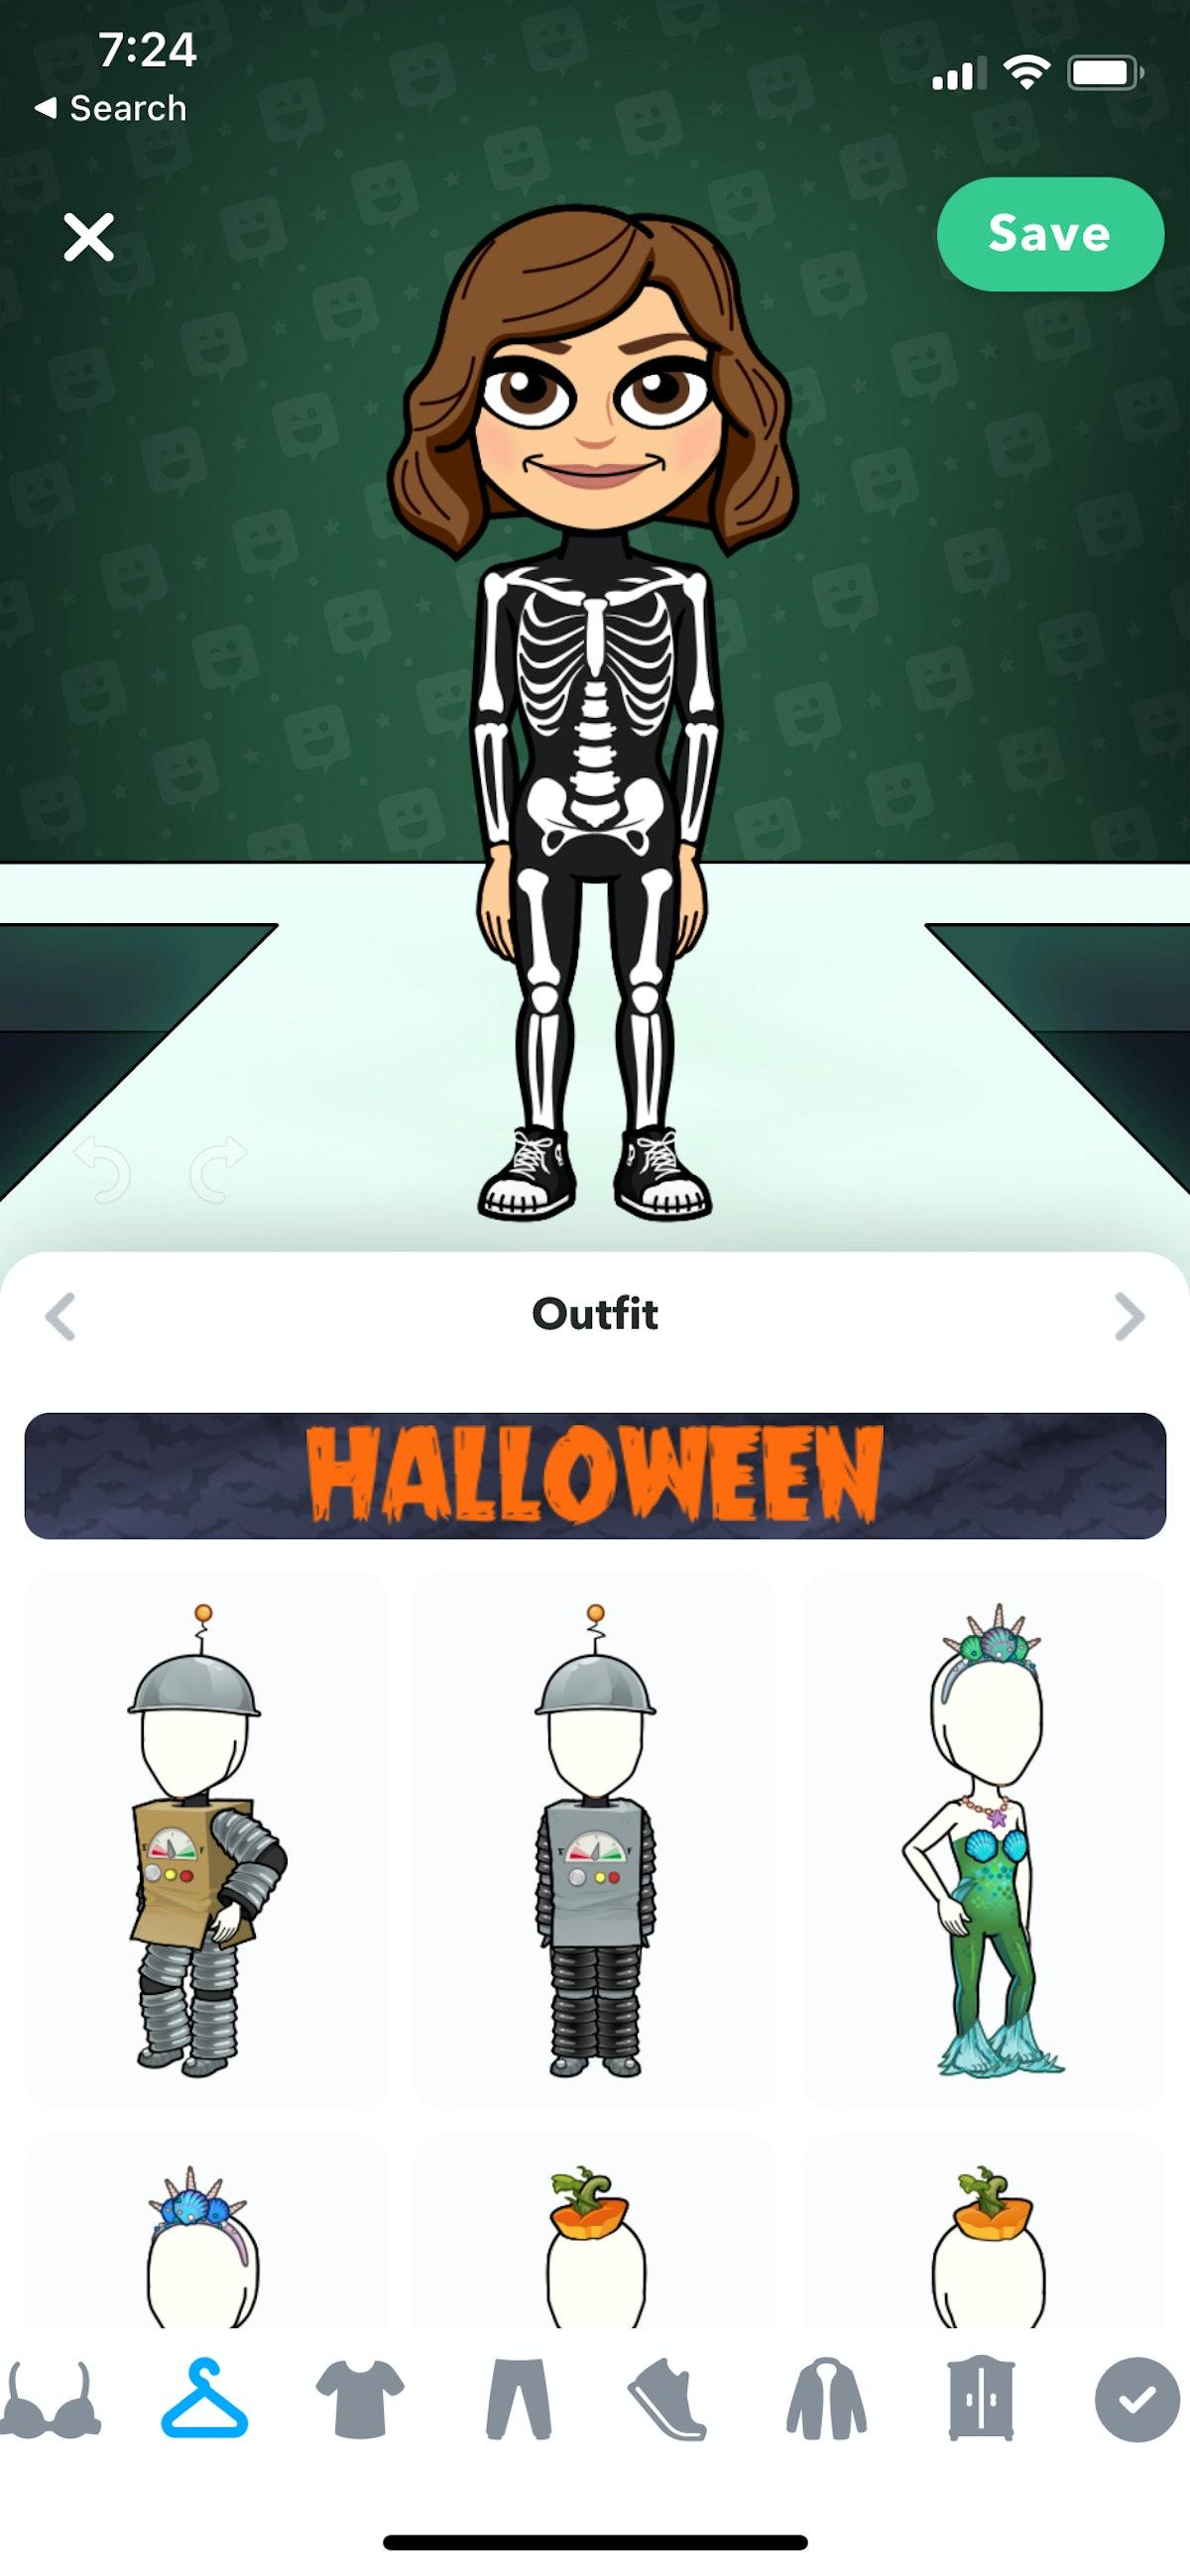 Dress up your Bitmoji in one of three new Halloween costumes.